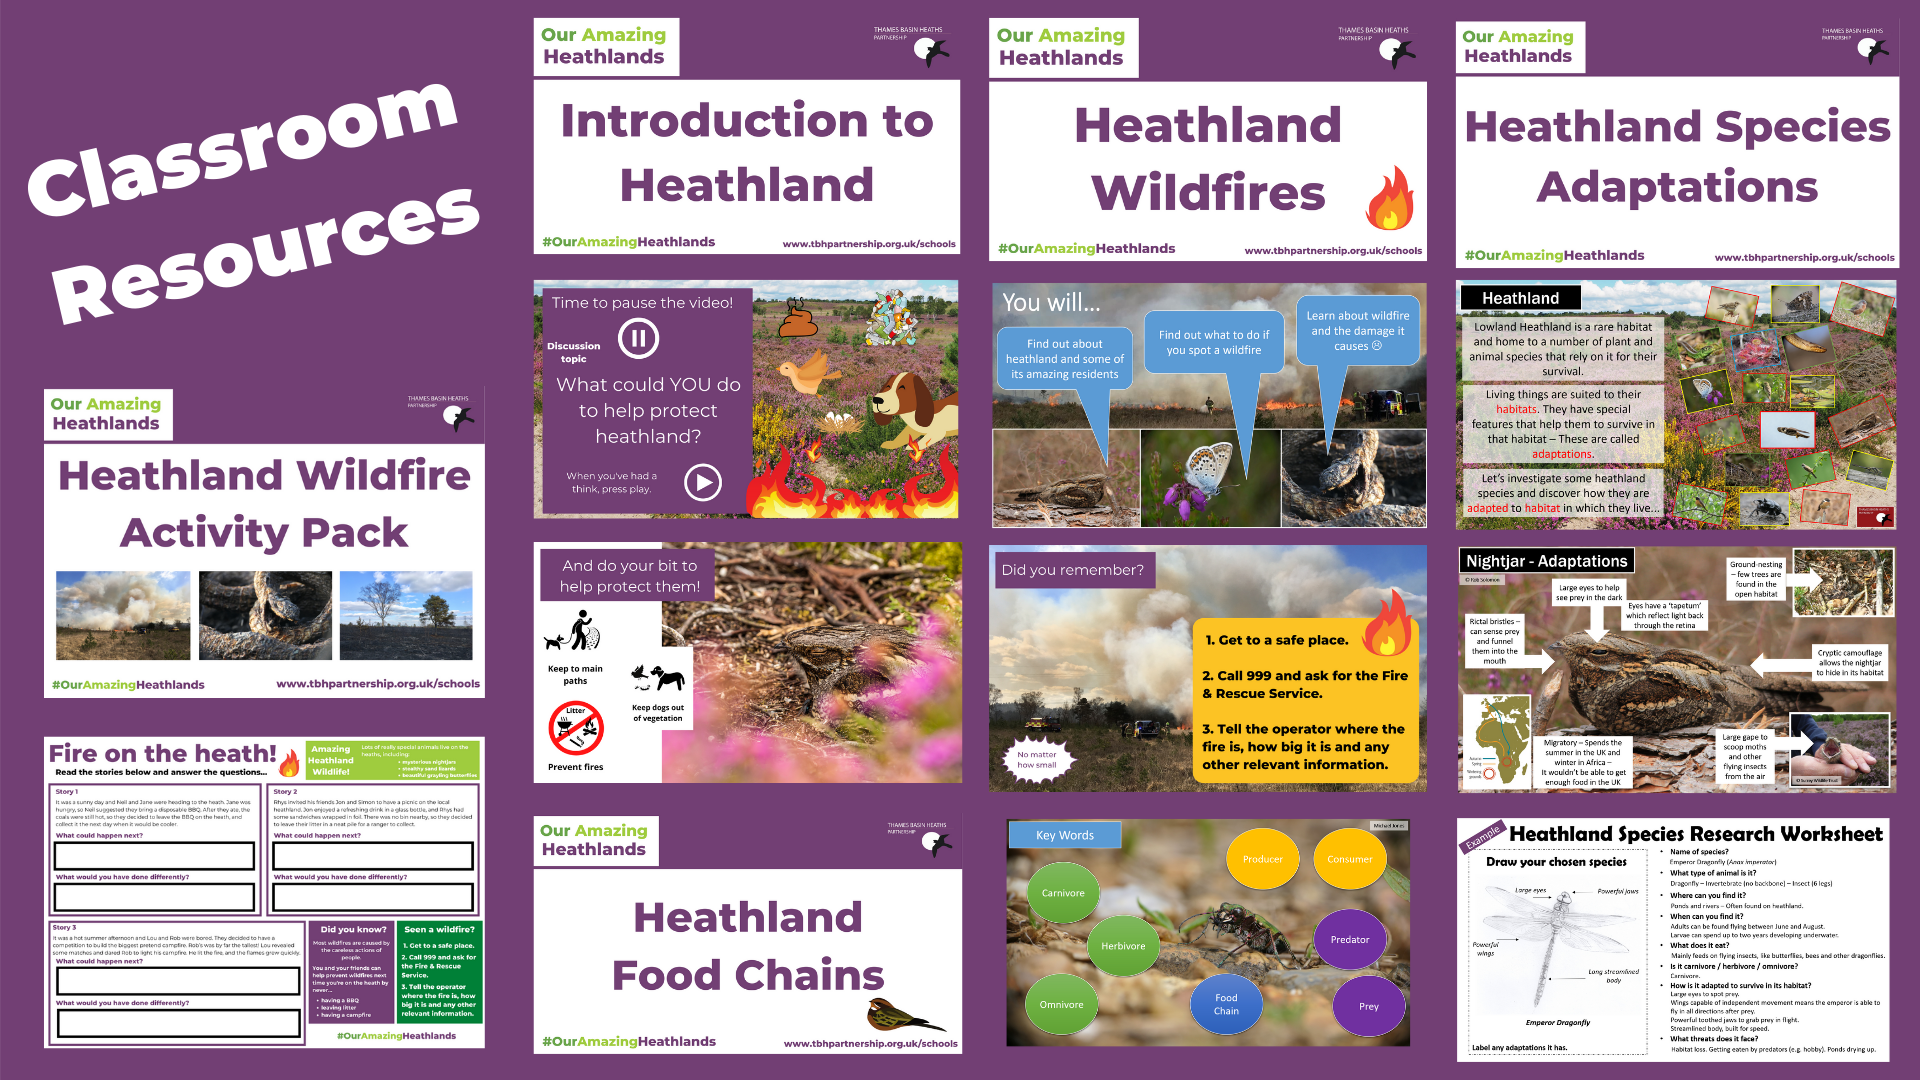 A montage highlighting heathland classroom resources